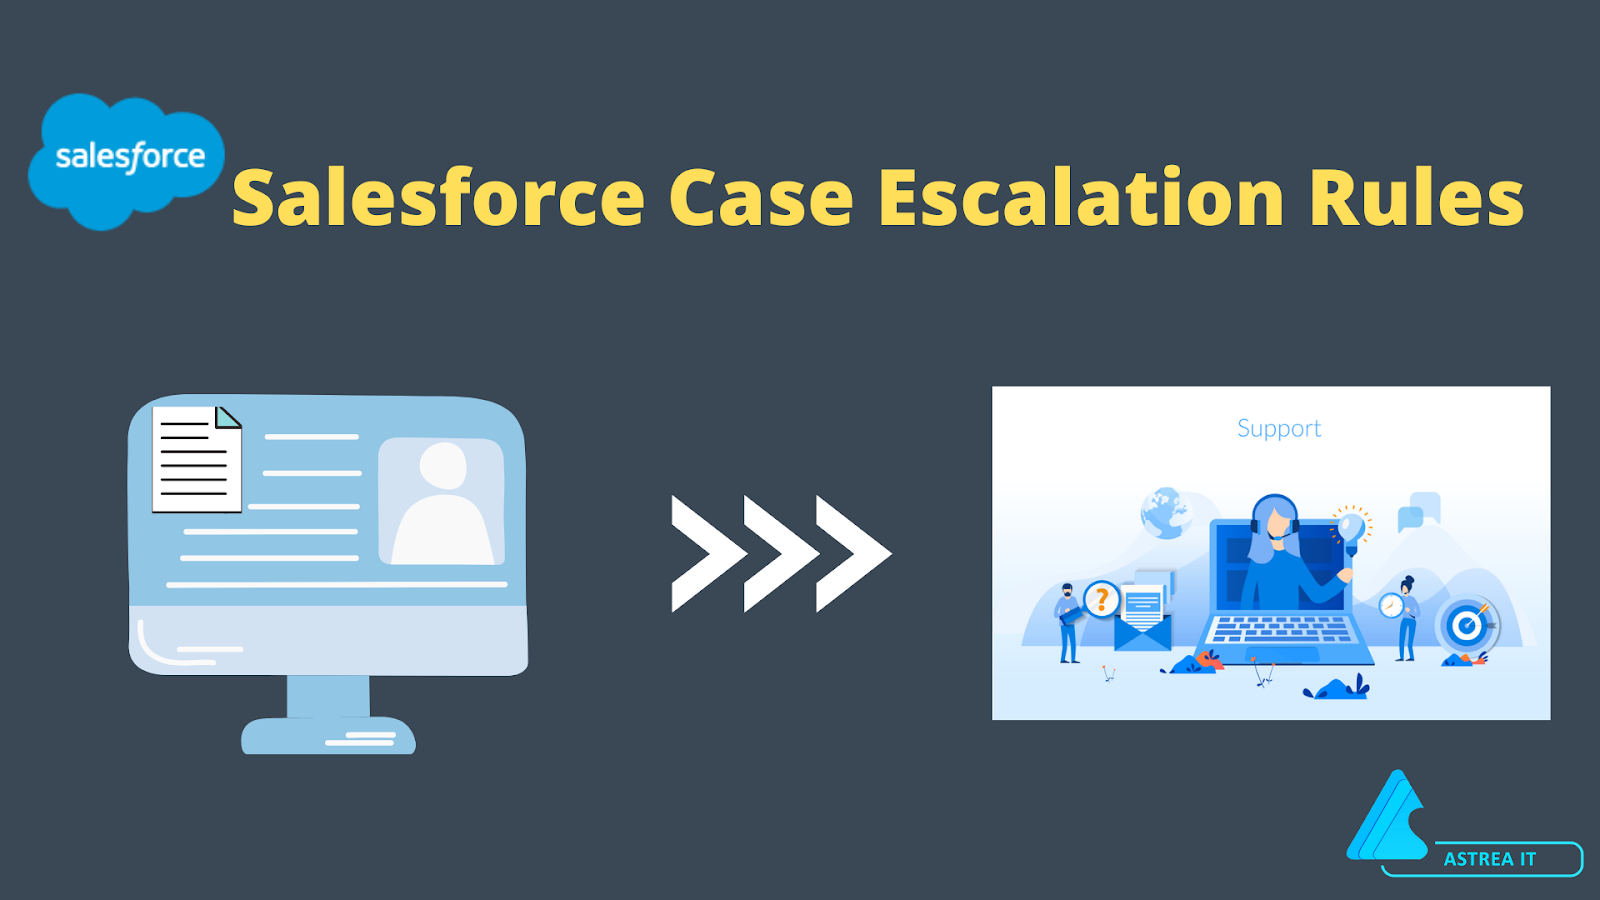 Salesforce Case Escalation Rules